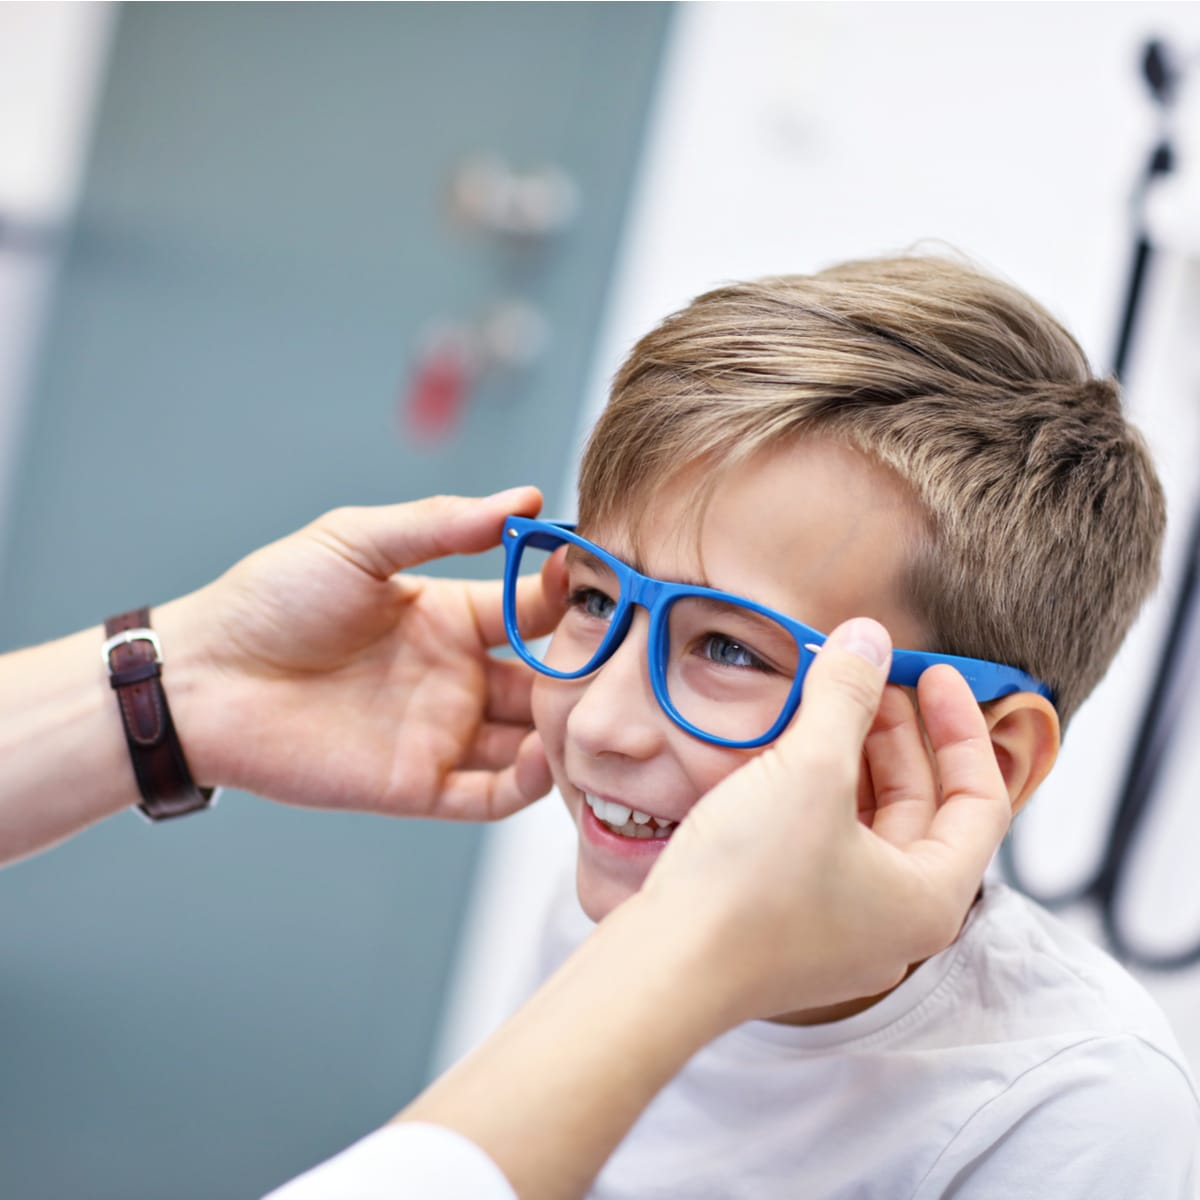 eye-patch-medical-4